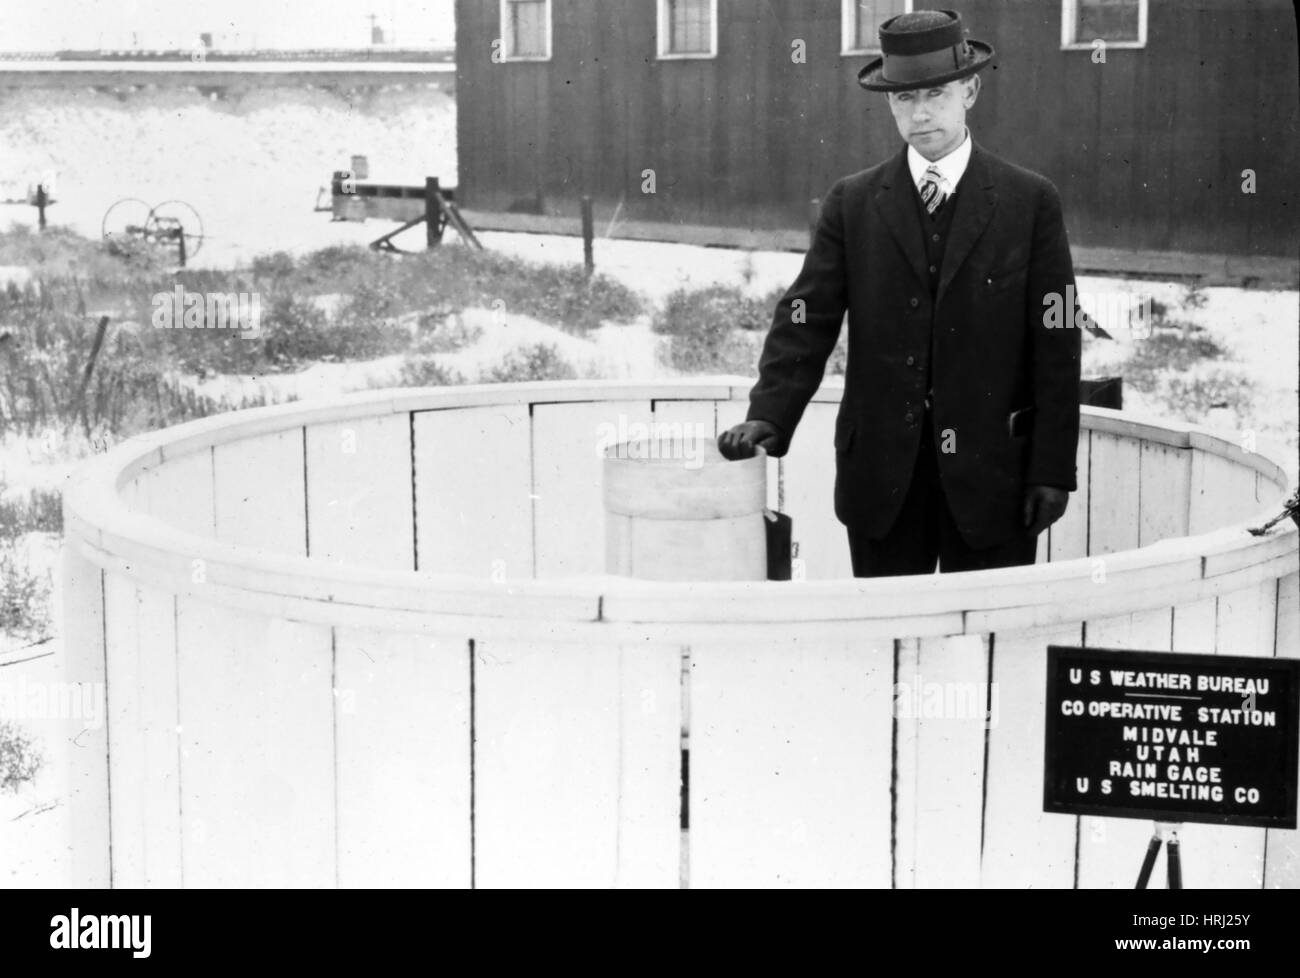 Indicatore pioggia, 1930 Immagini Stock